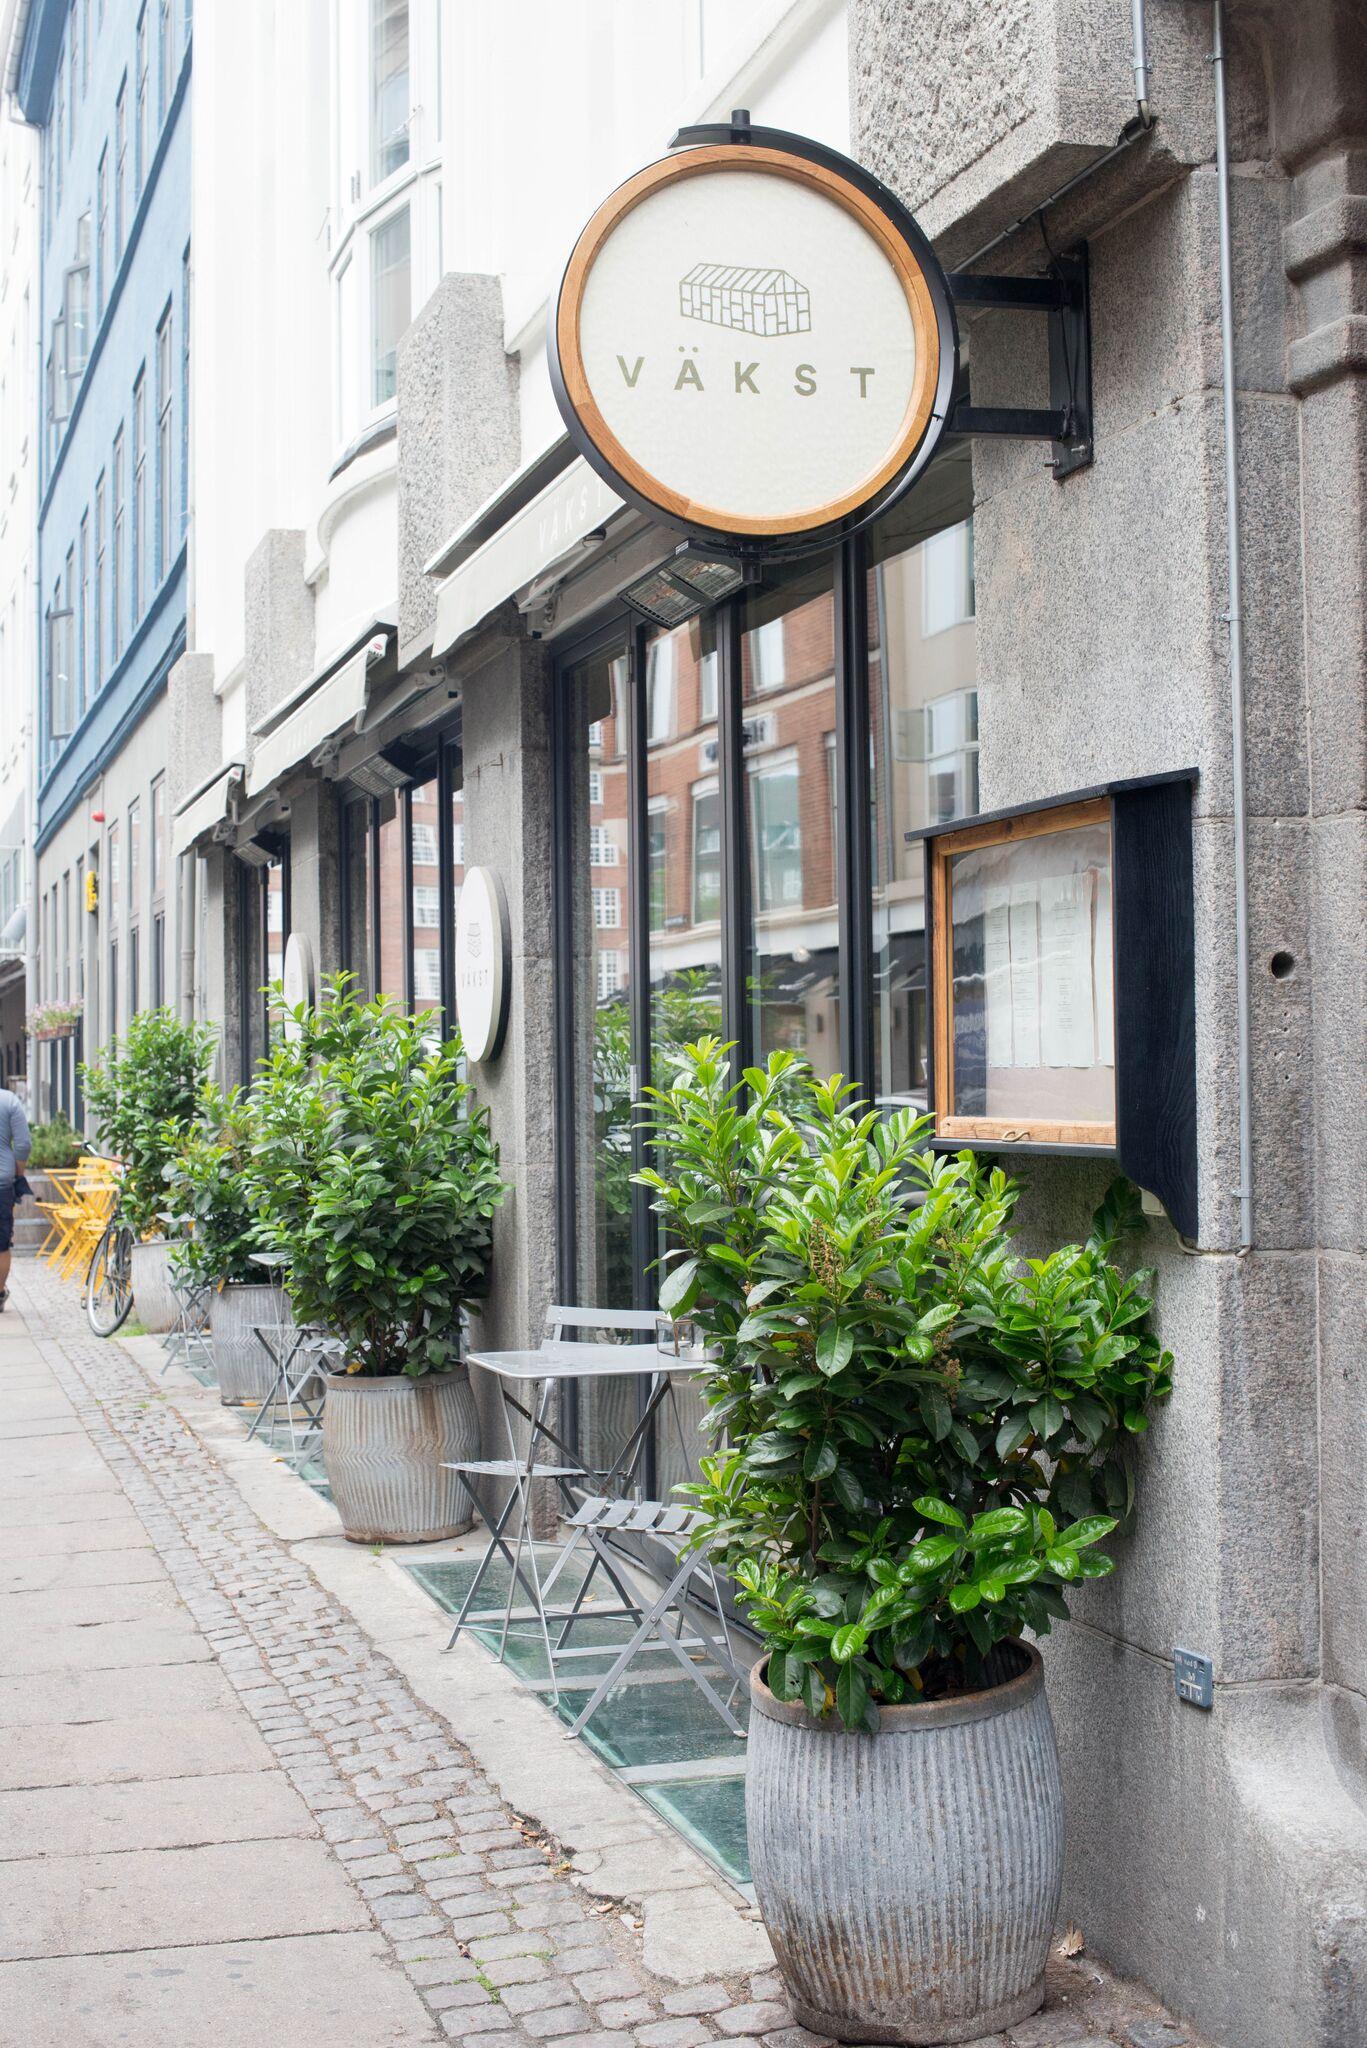 vaskt where to eat in copenhagen